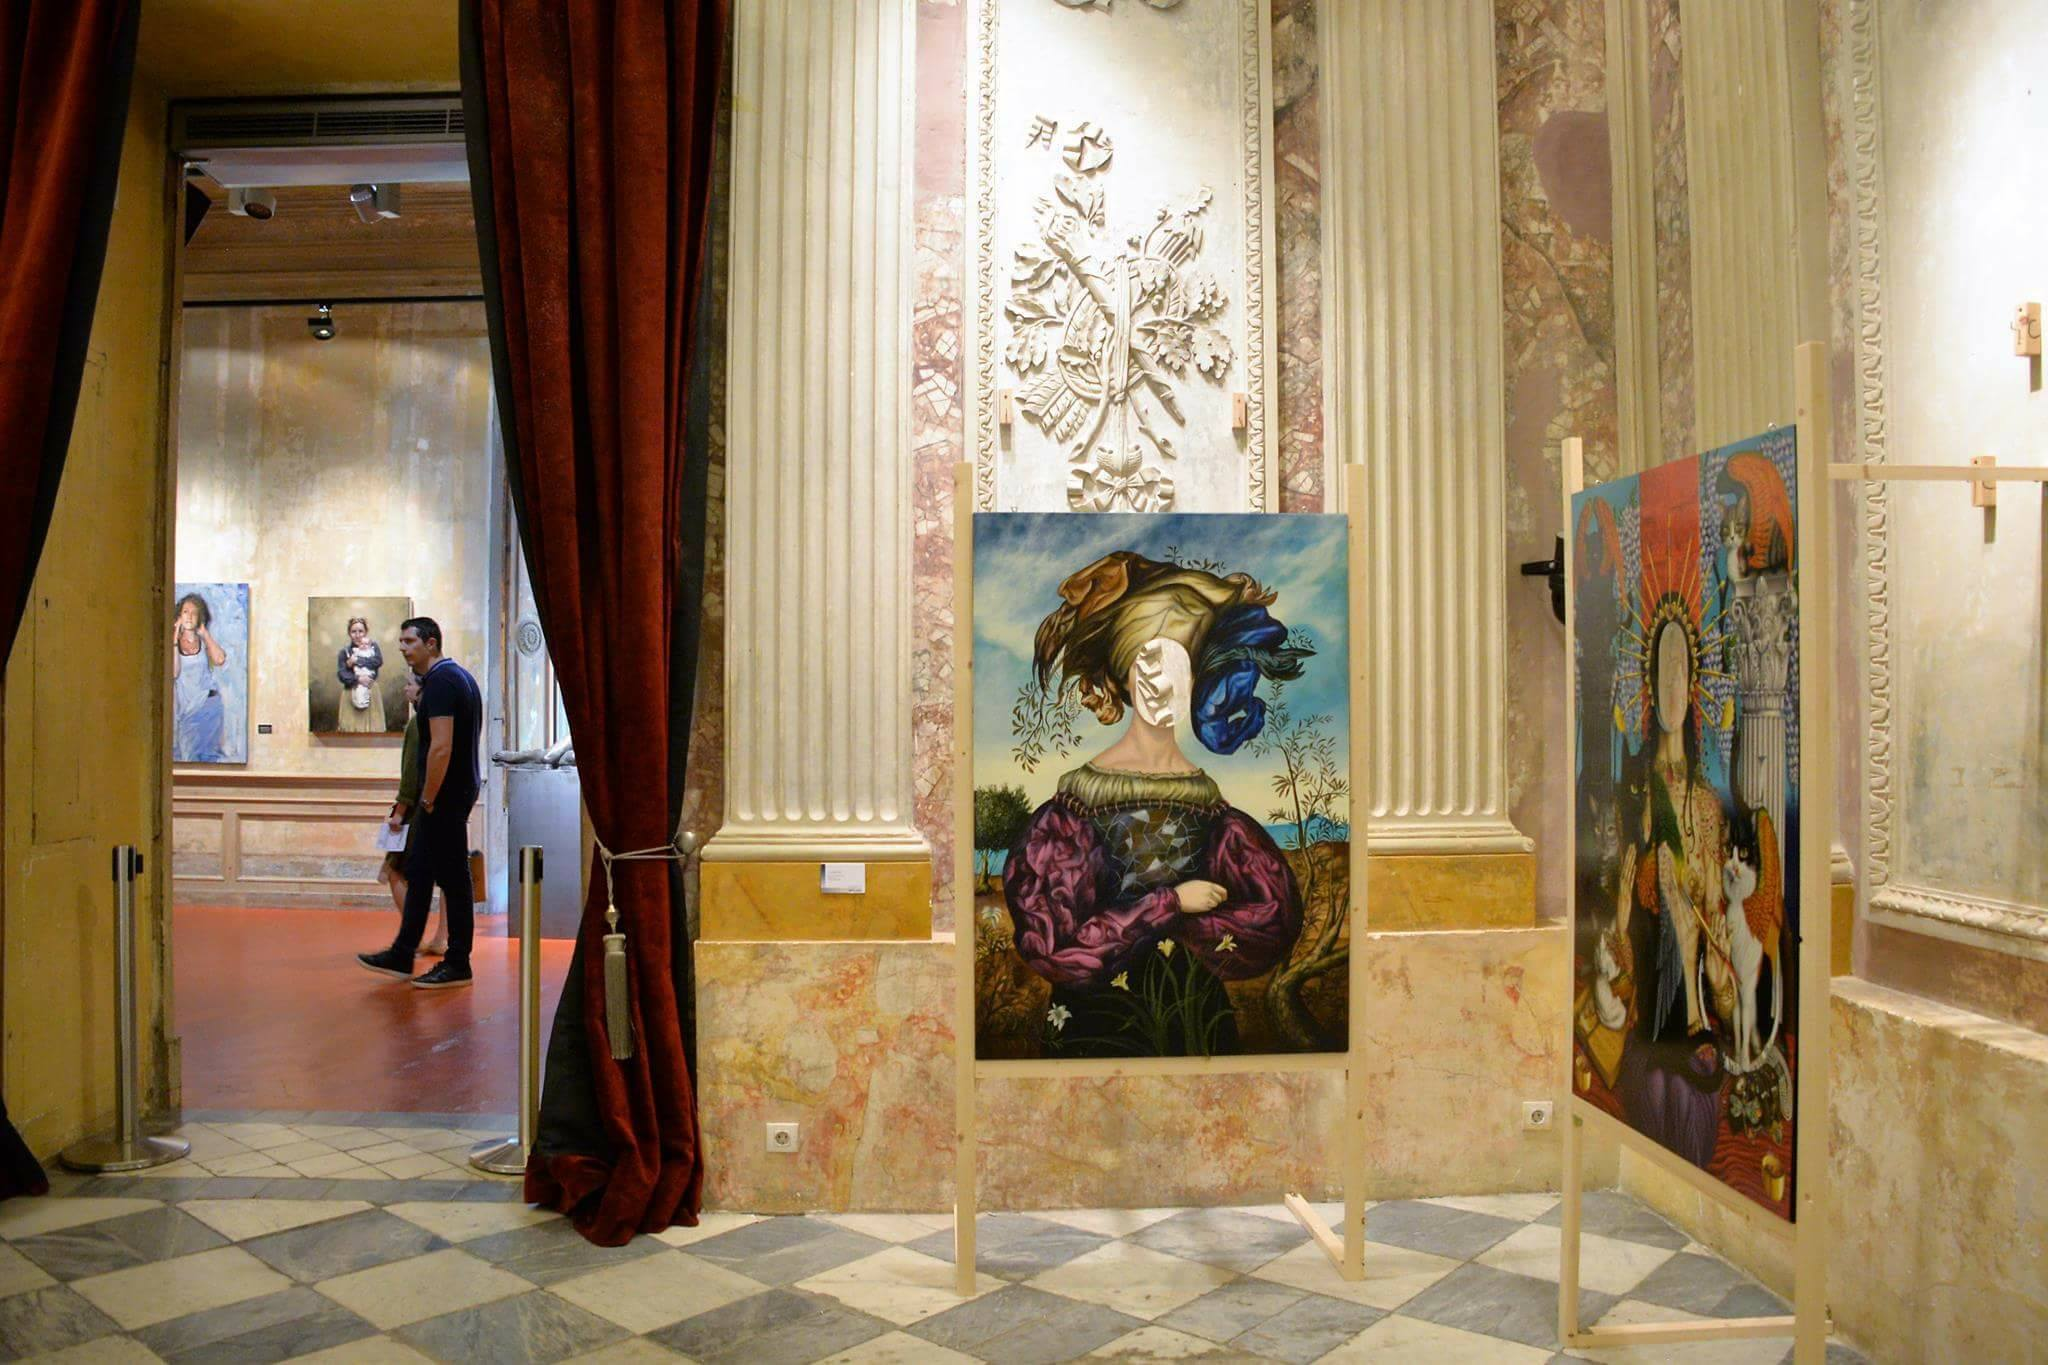 Nuit européenne des musées, Museo Europeo de Arte Moderno (MEAM) Barcelone, Espagne 2017.